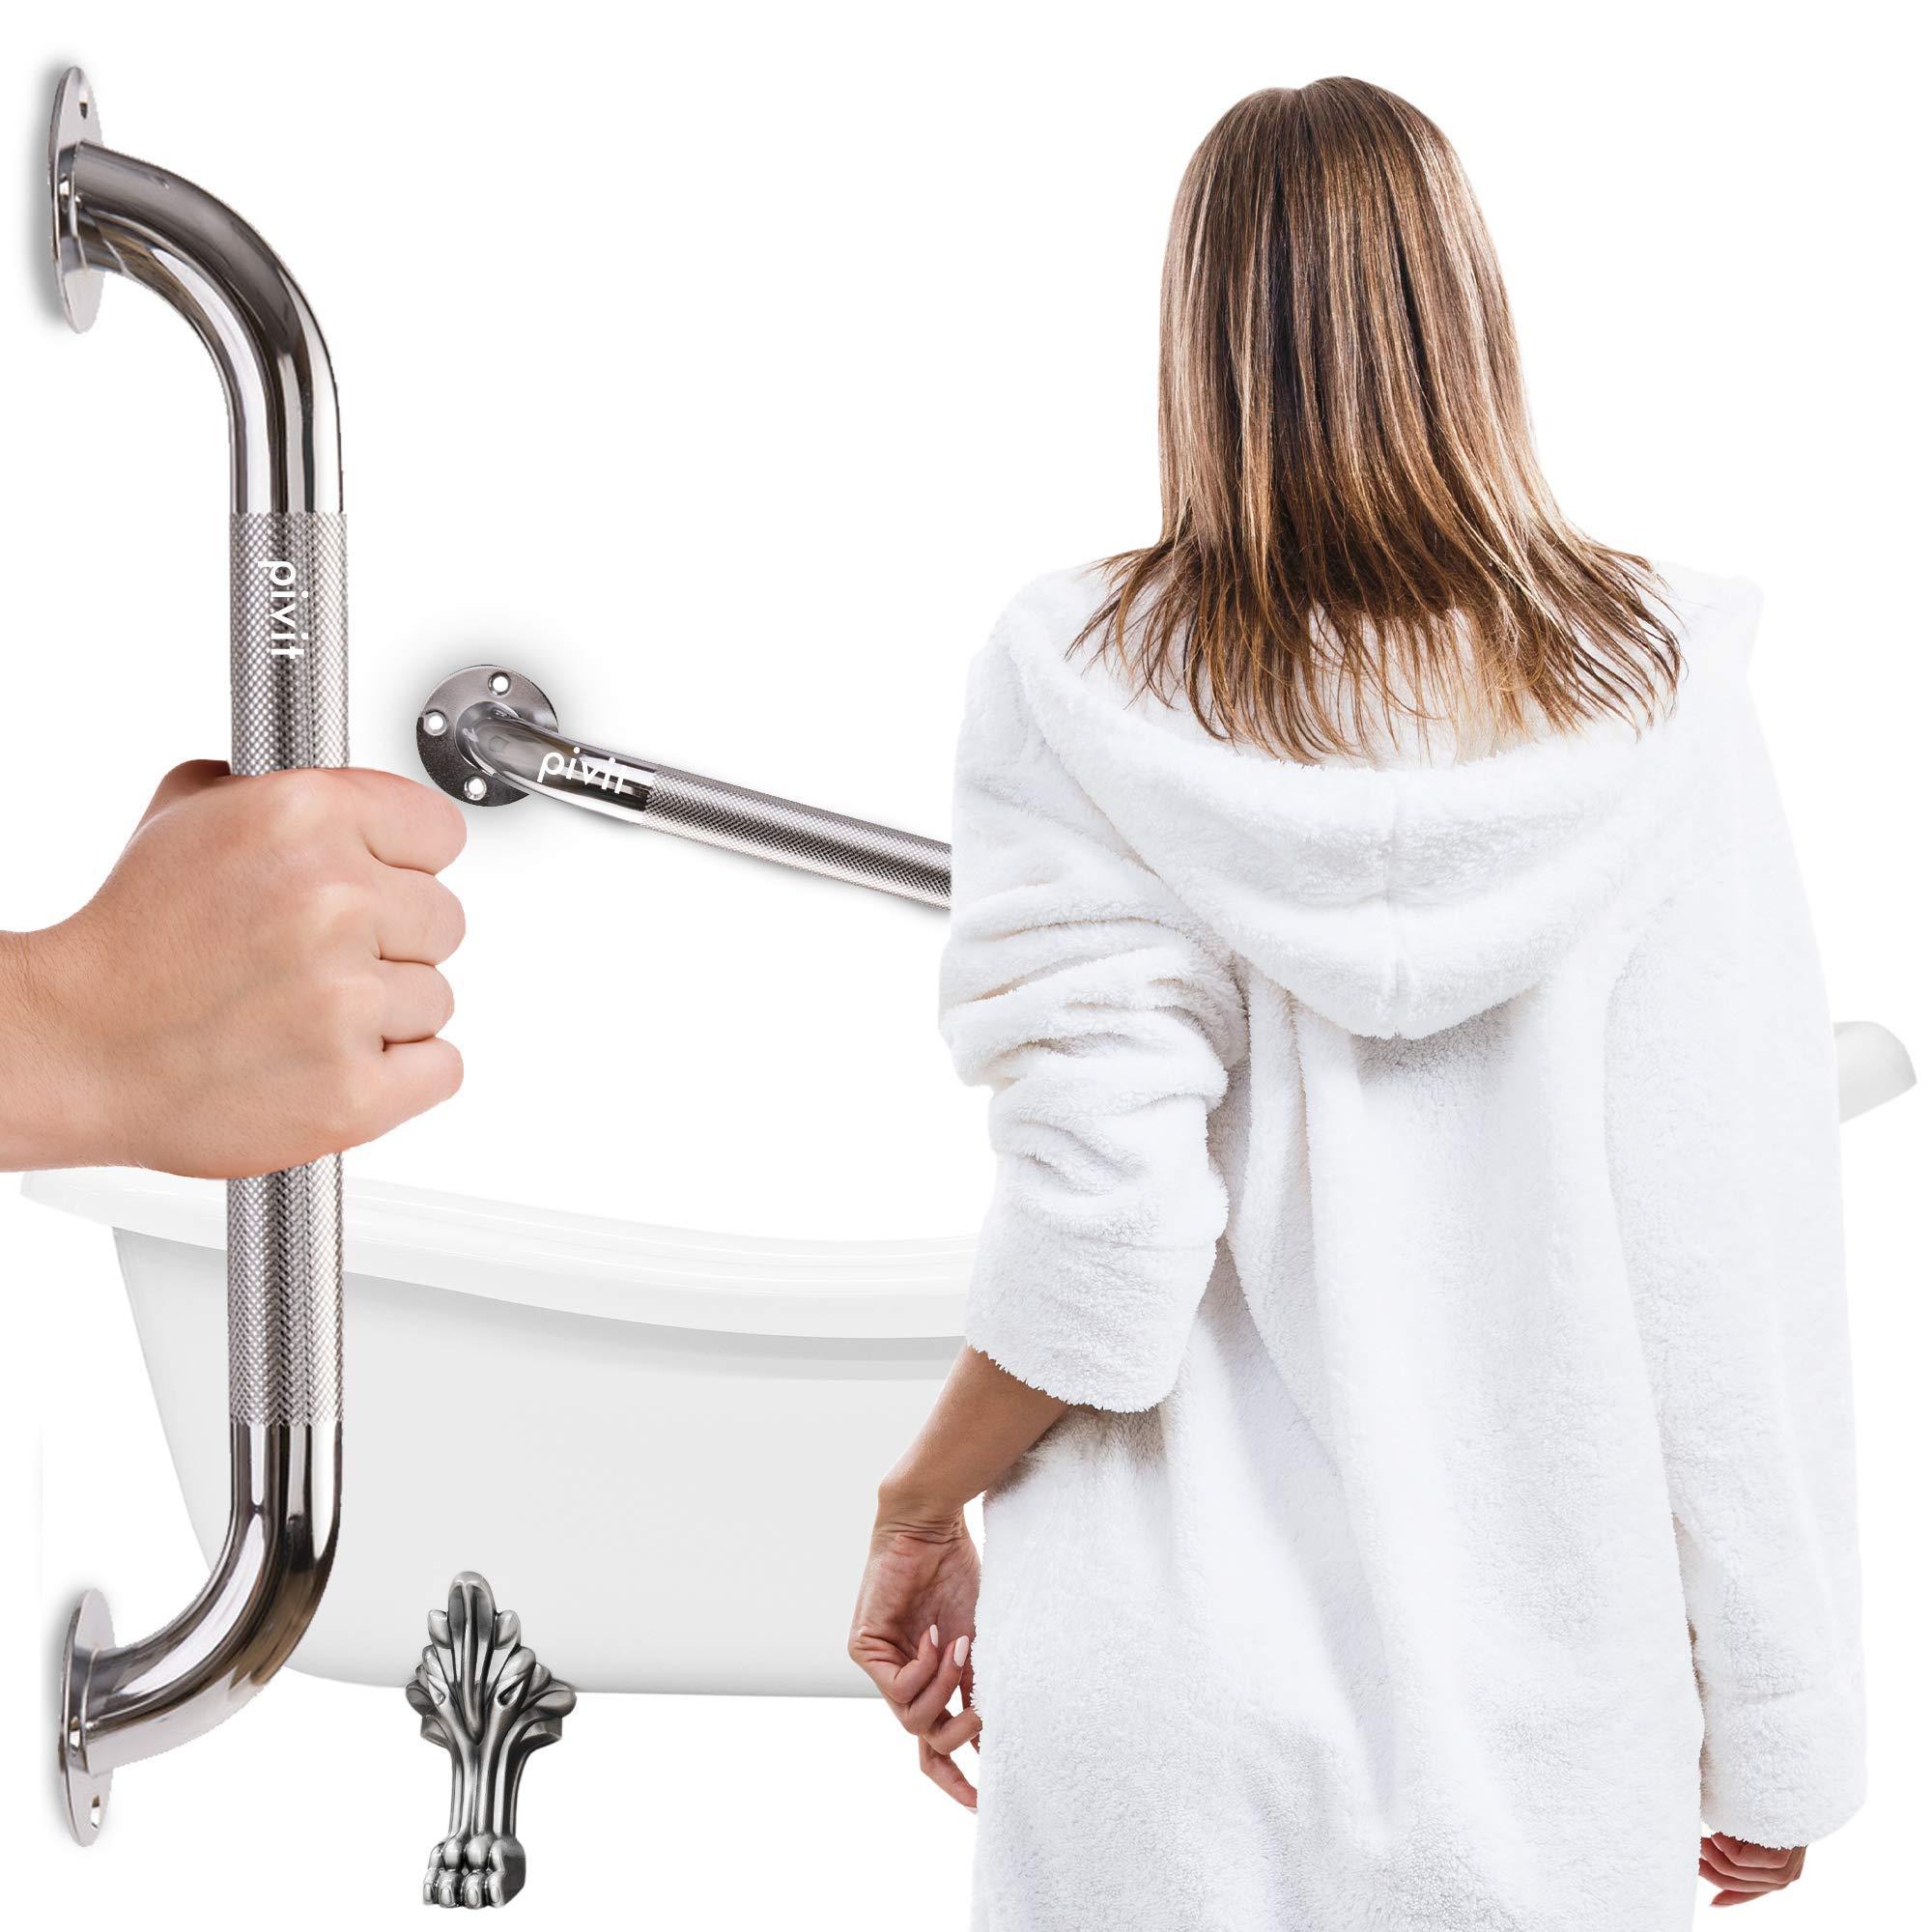 "Pivit Knurled Chrome Steel Shower Handle & Bathroom Balance Grab Bar | 18"" | Textured Sturdy & Secure Comfortable Non Slip Grip | for Elderly, Seniors, Handicap & Disabled | Lifetime Limited Warranty"